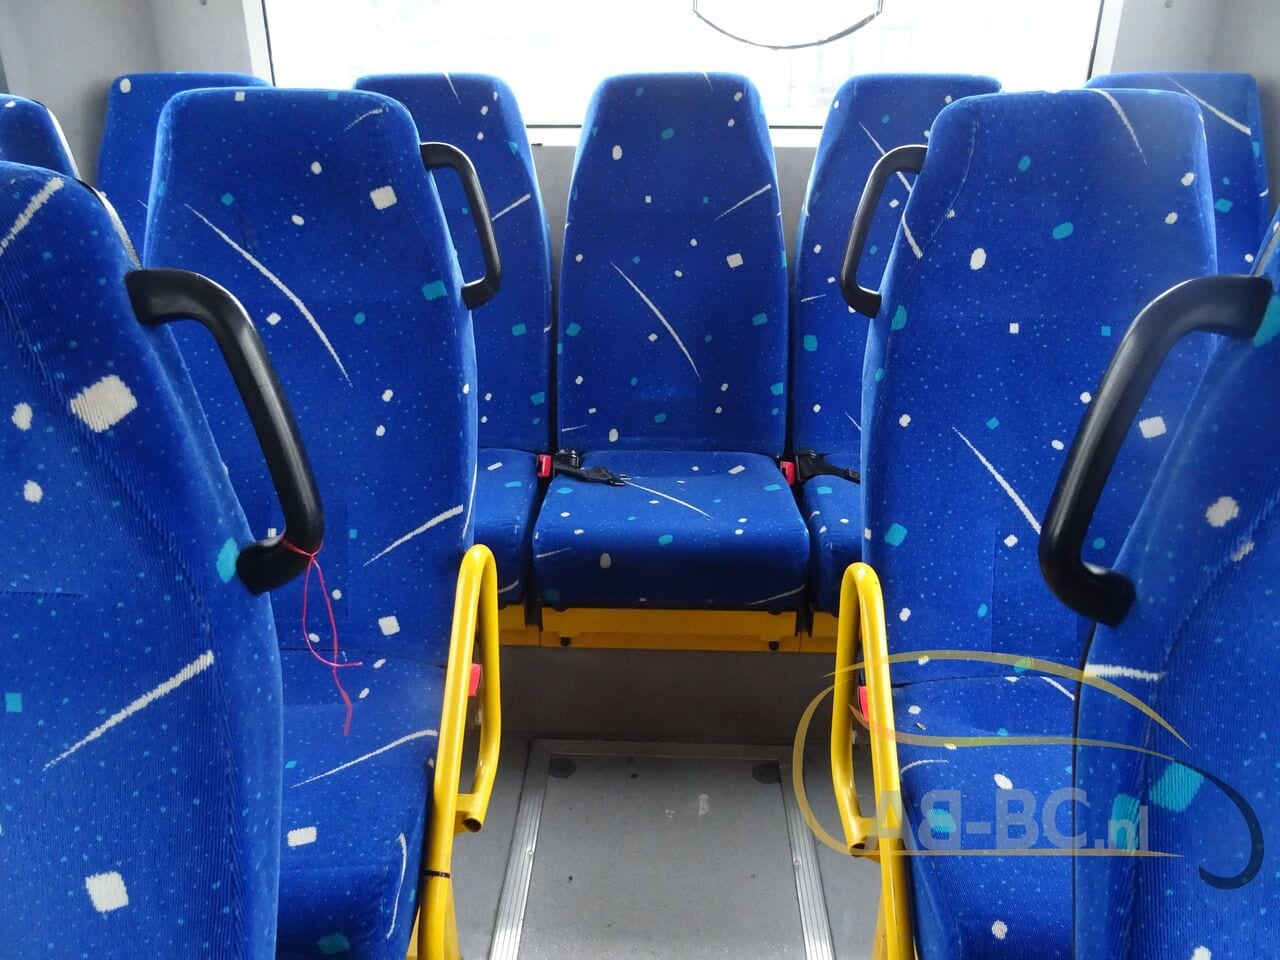 interurban-busIVECO-Irisbus-Recreo-64-Seats---1626160163816292940_big_4d692279c7a6933e4fb12840585b2082--21071309575983154500